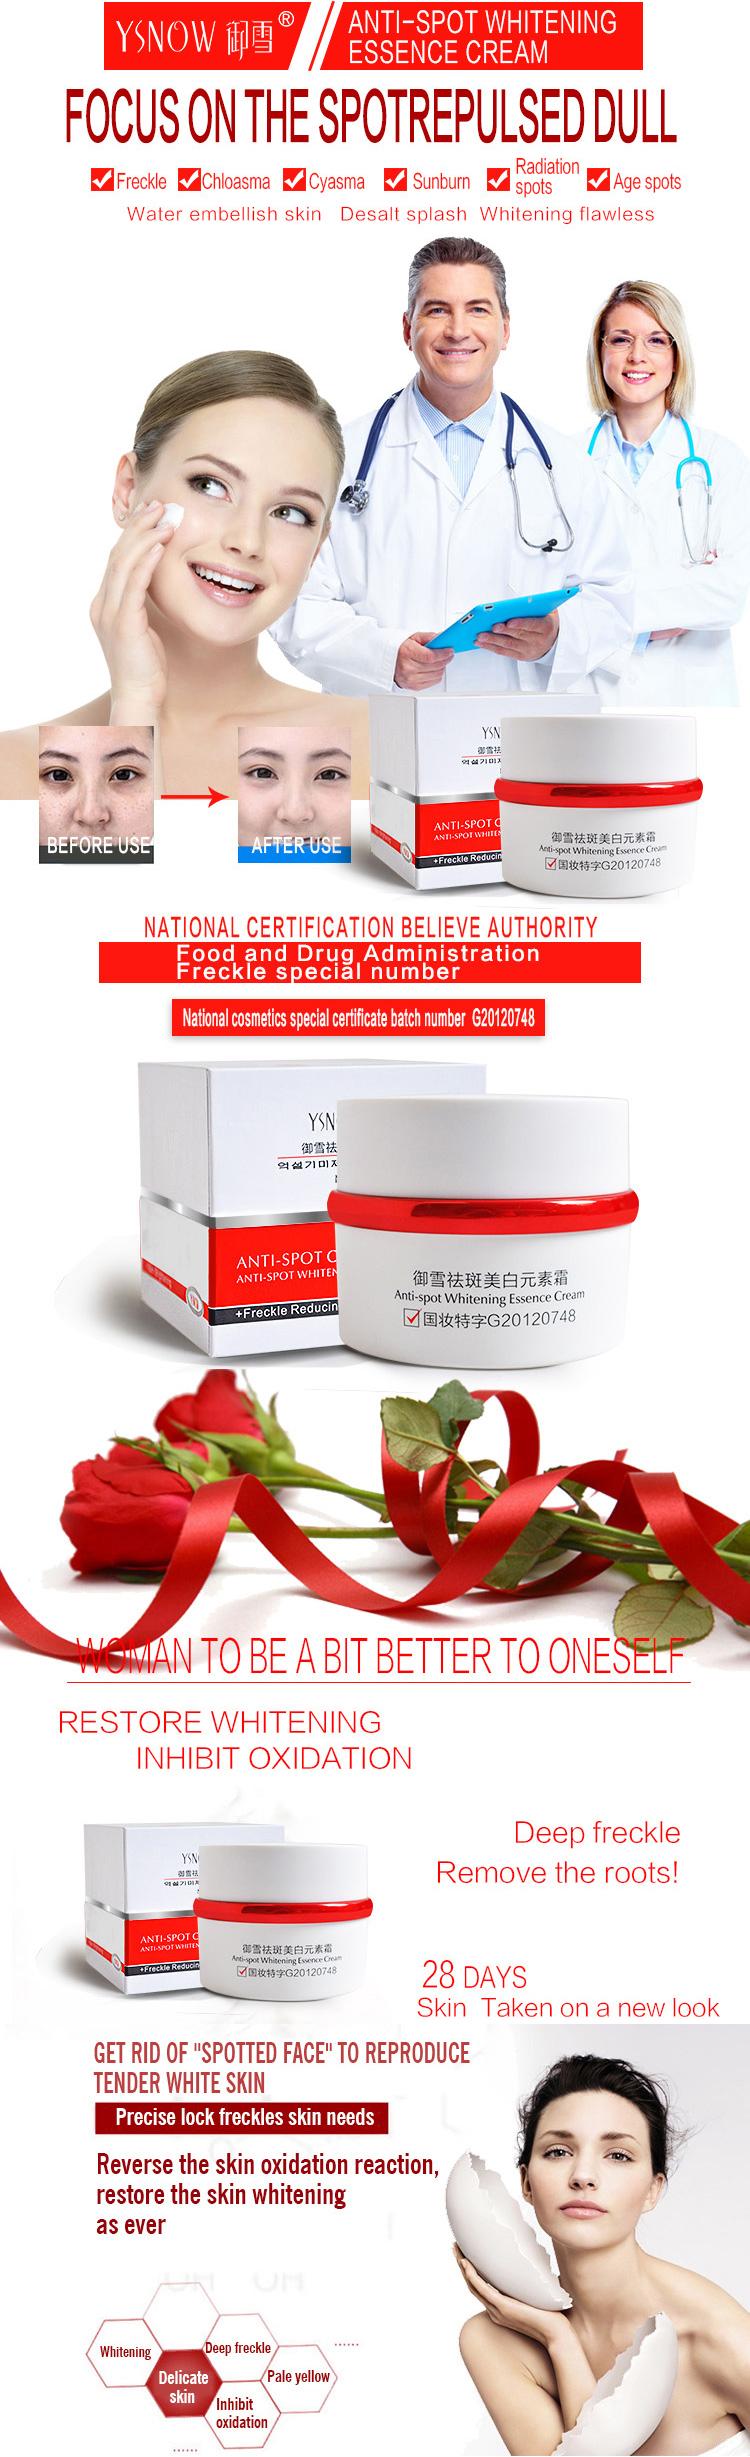 Korean Beauty Skin Spot Remover Face Lotion Hot Sale Popular Whitening Anti Freckle Facial Cream